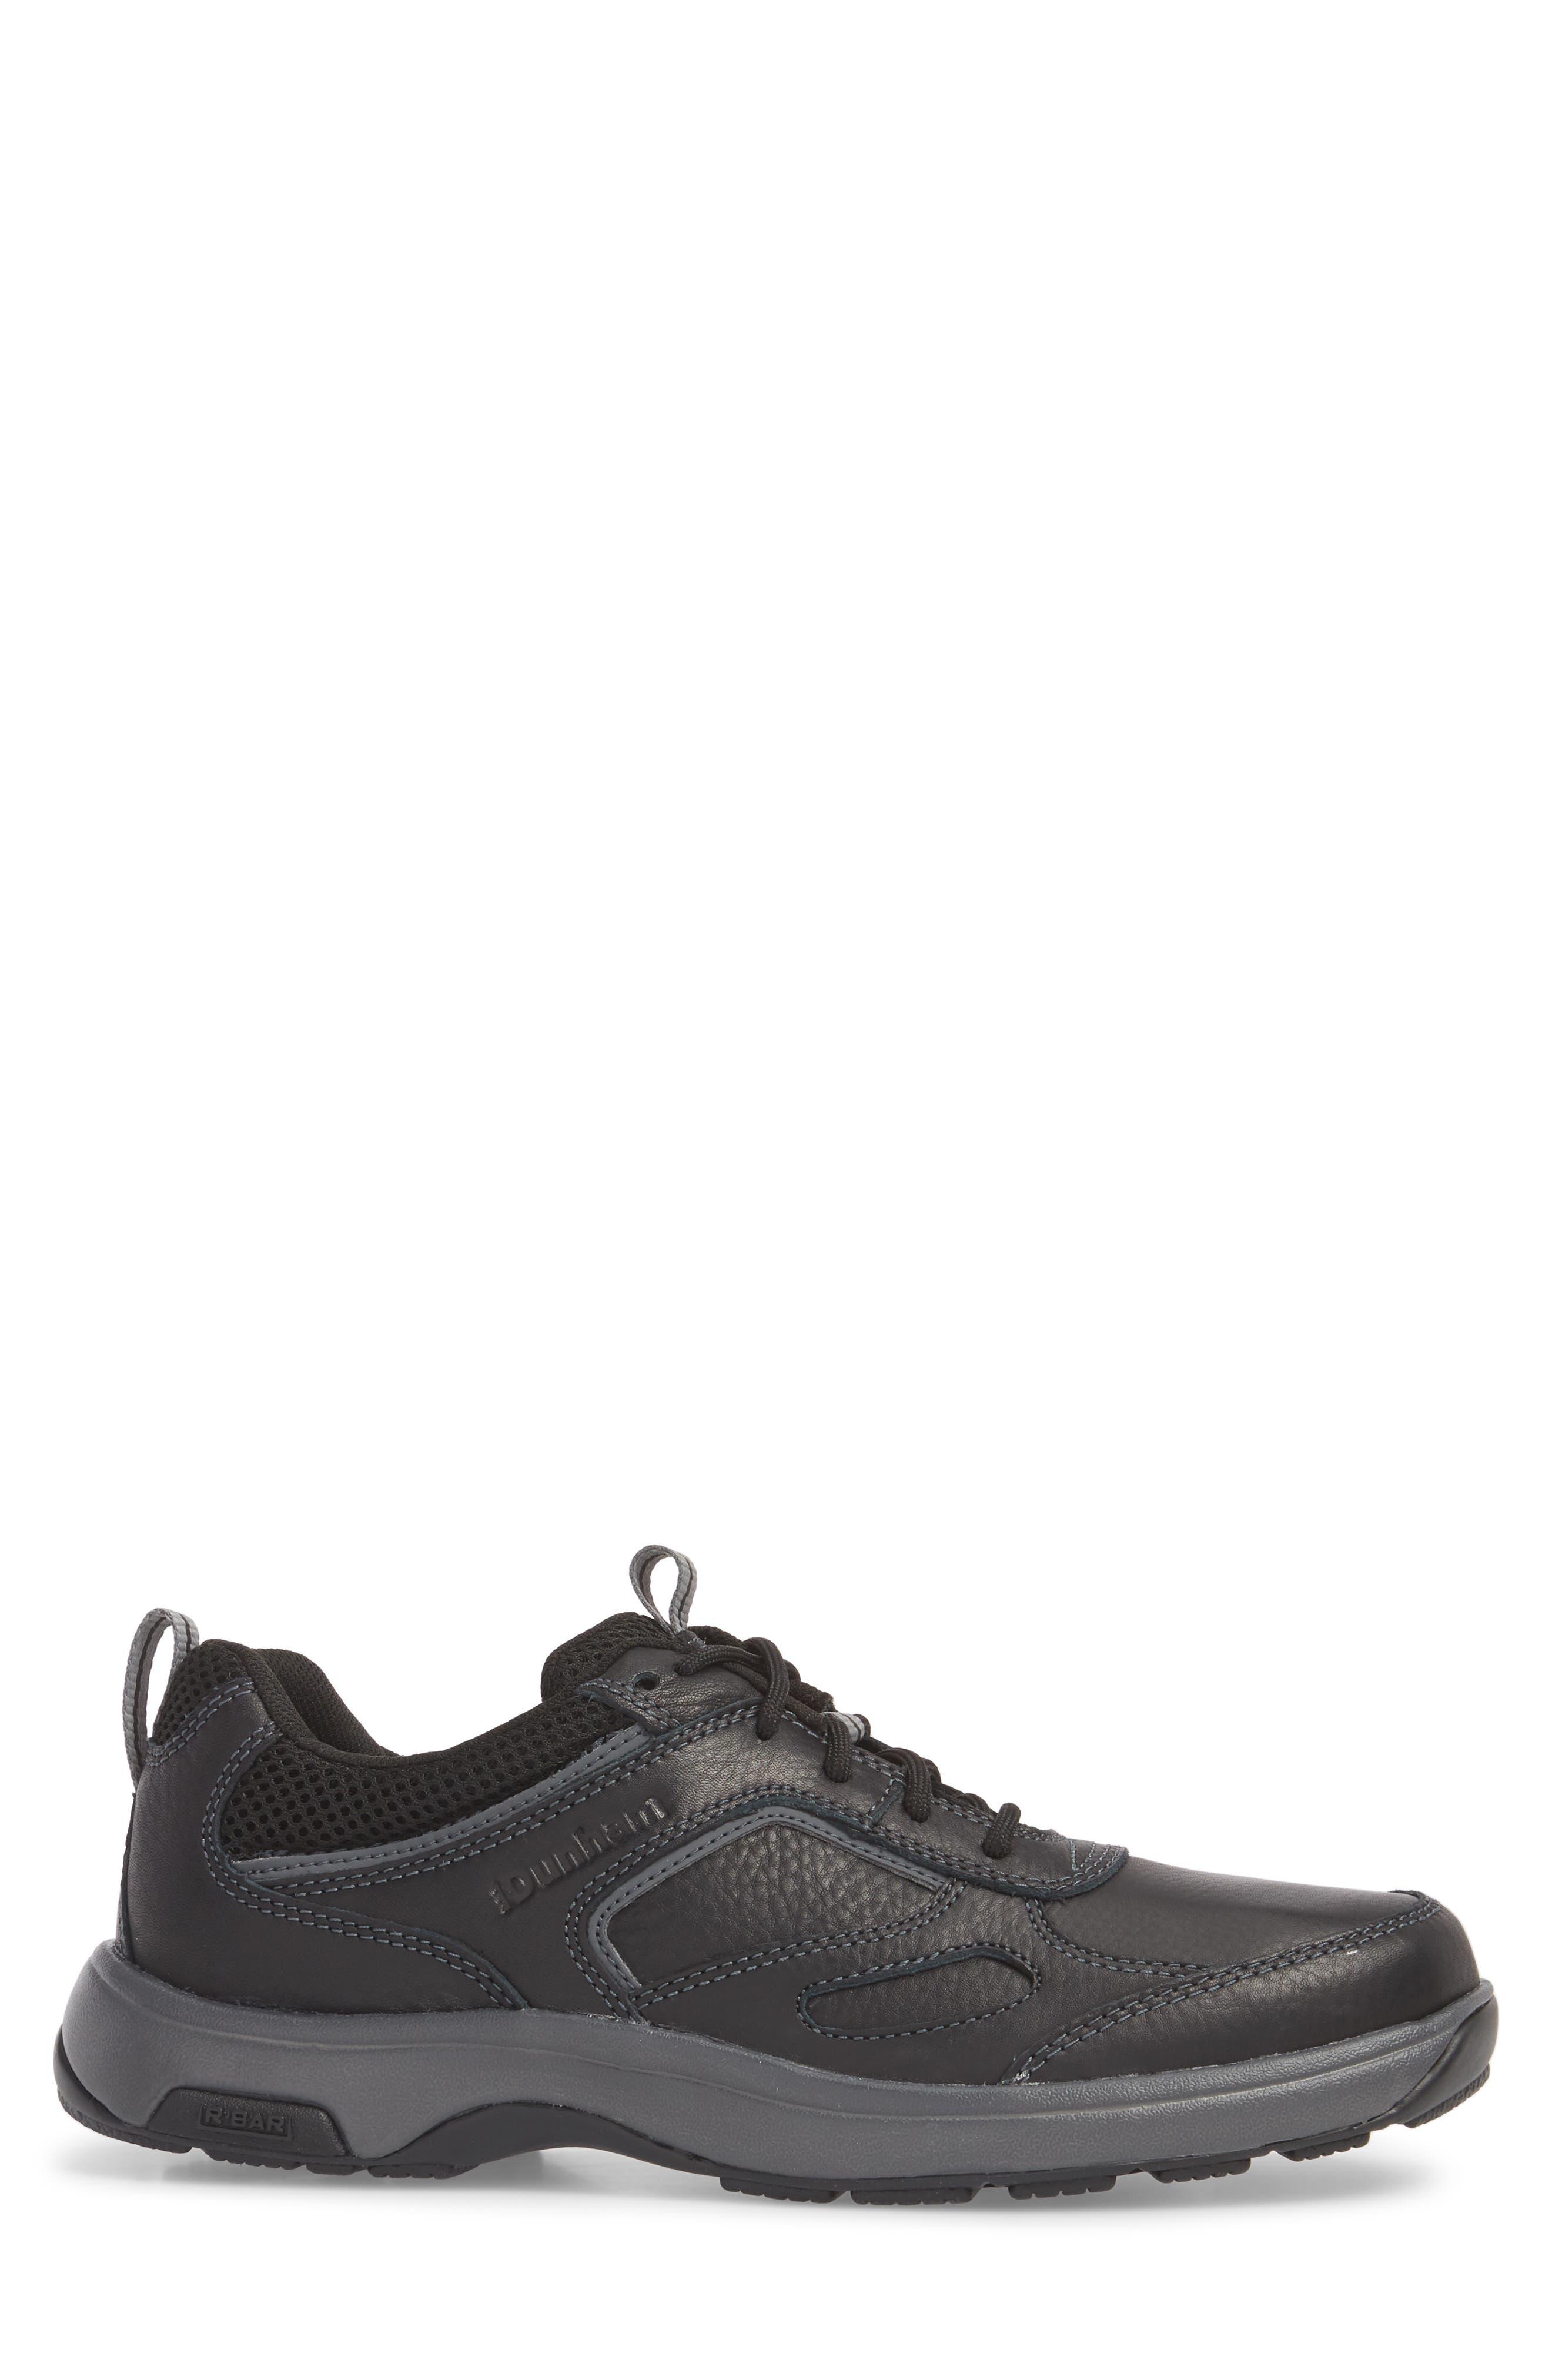 8000 Uball Sneaker,                             Alternate thumbnail 3, color,                             001